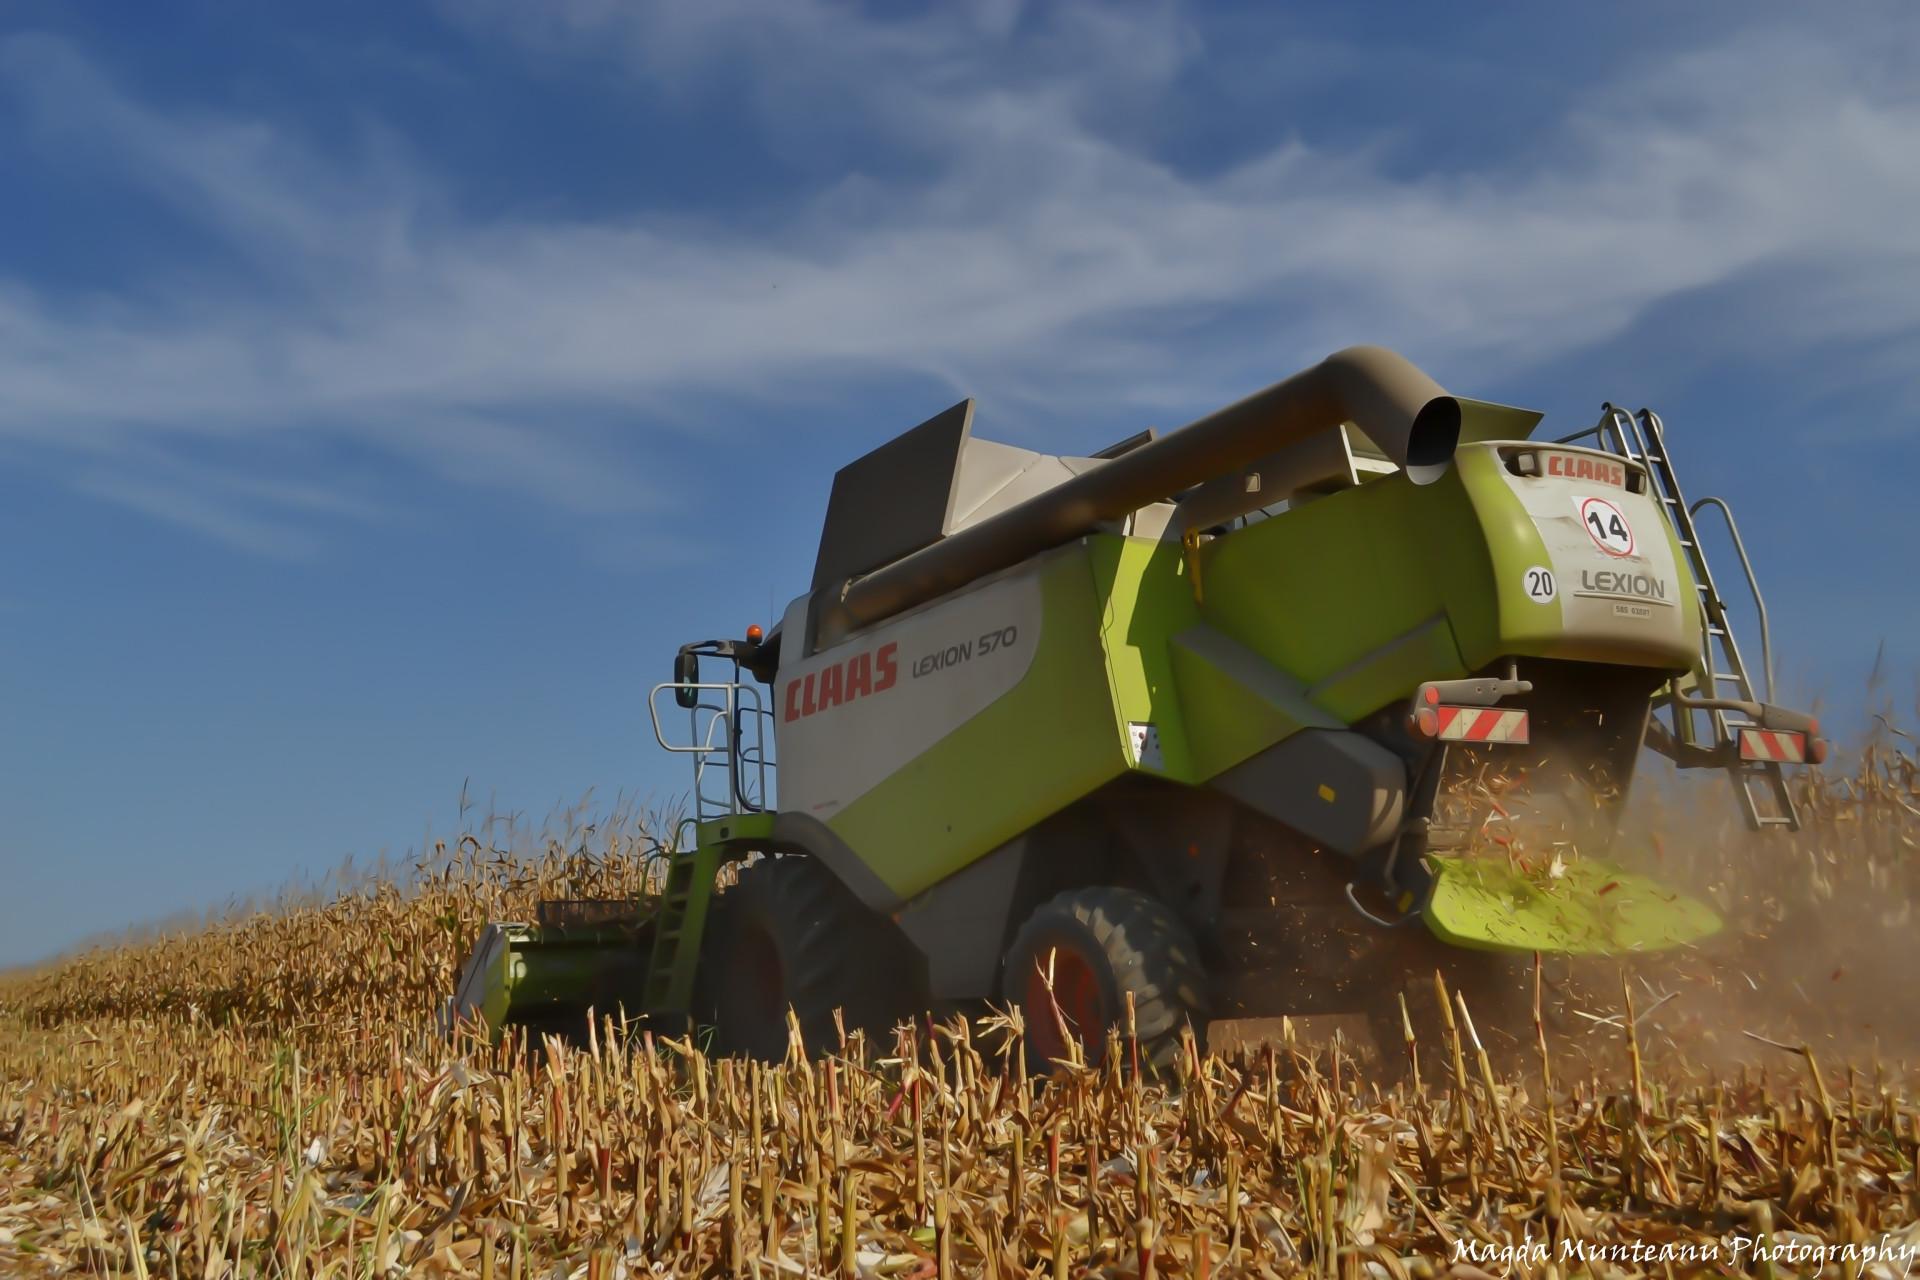 Harvesting works